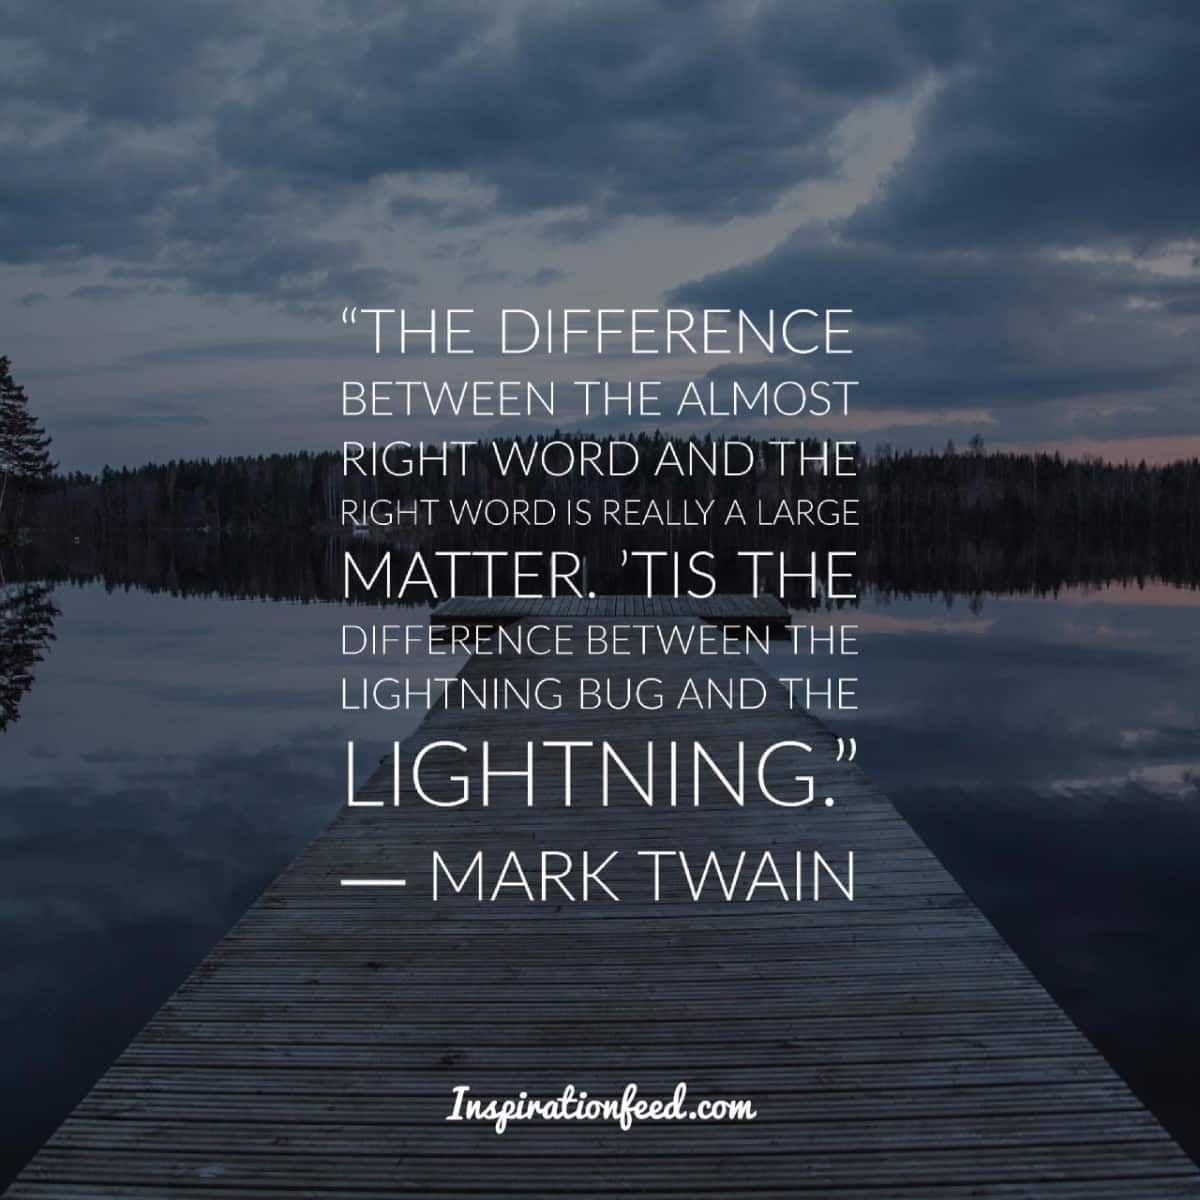 Mark Twain Quotes #Mark #Twain #Quotes #Life #Inspiration ...